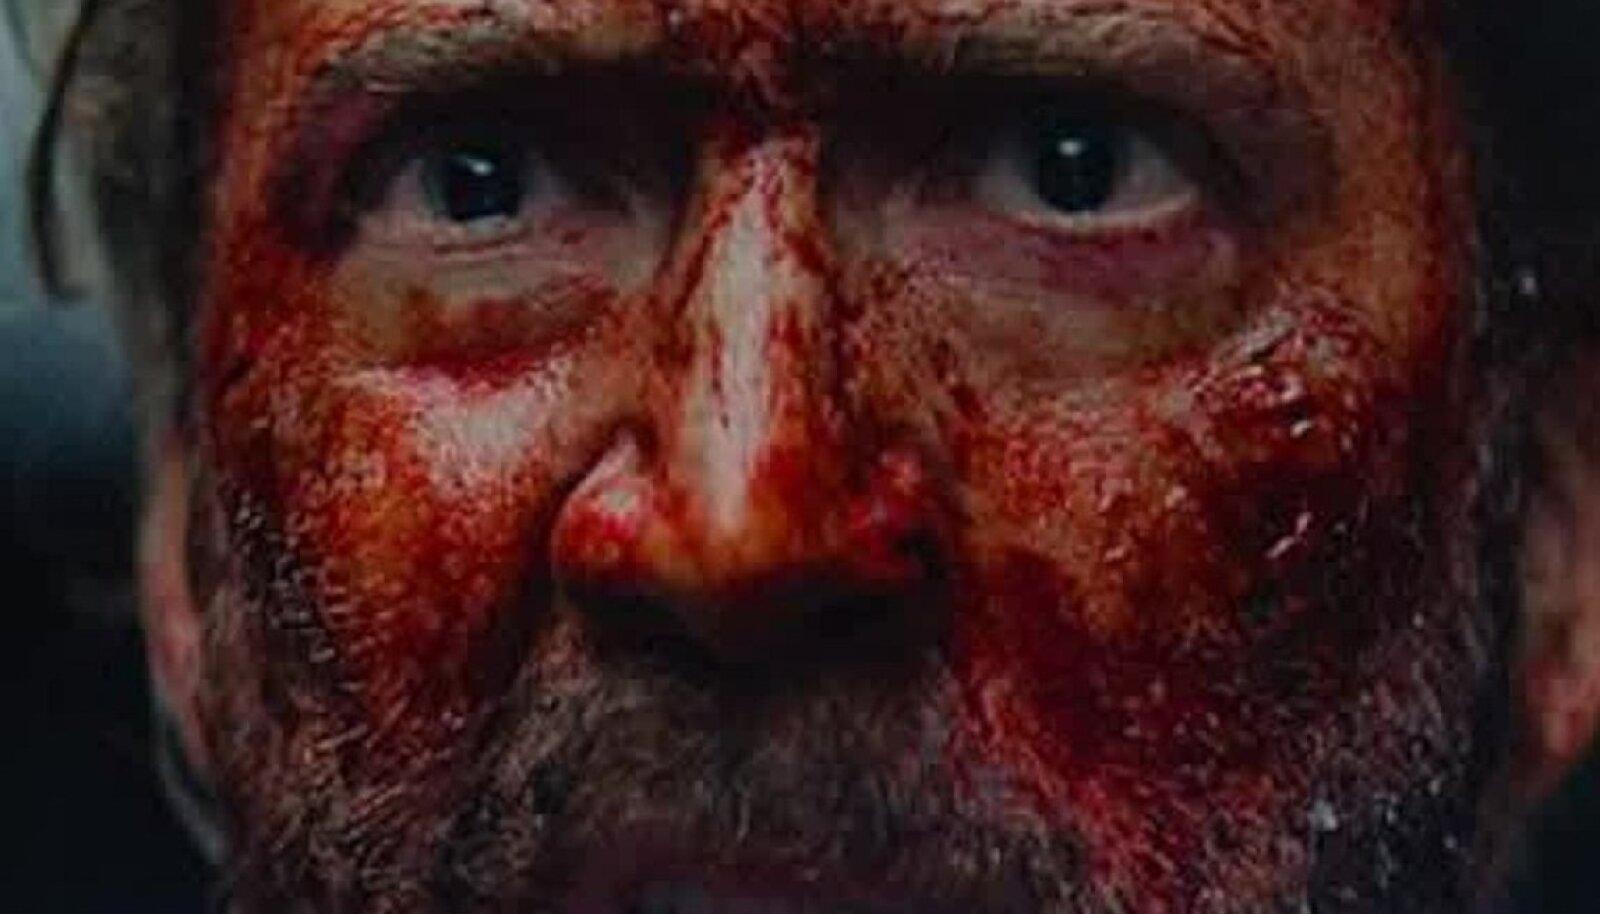 "Nicolase Cage'i uus film ""Mandy"" (Panos Cosmatos) linastub Directors' Fortnight programmis."